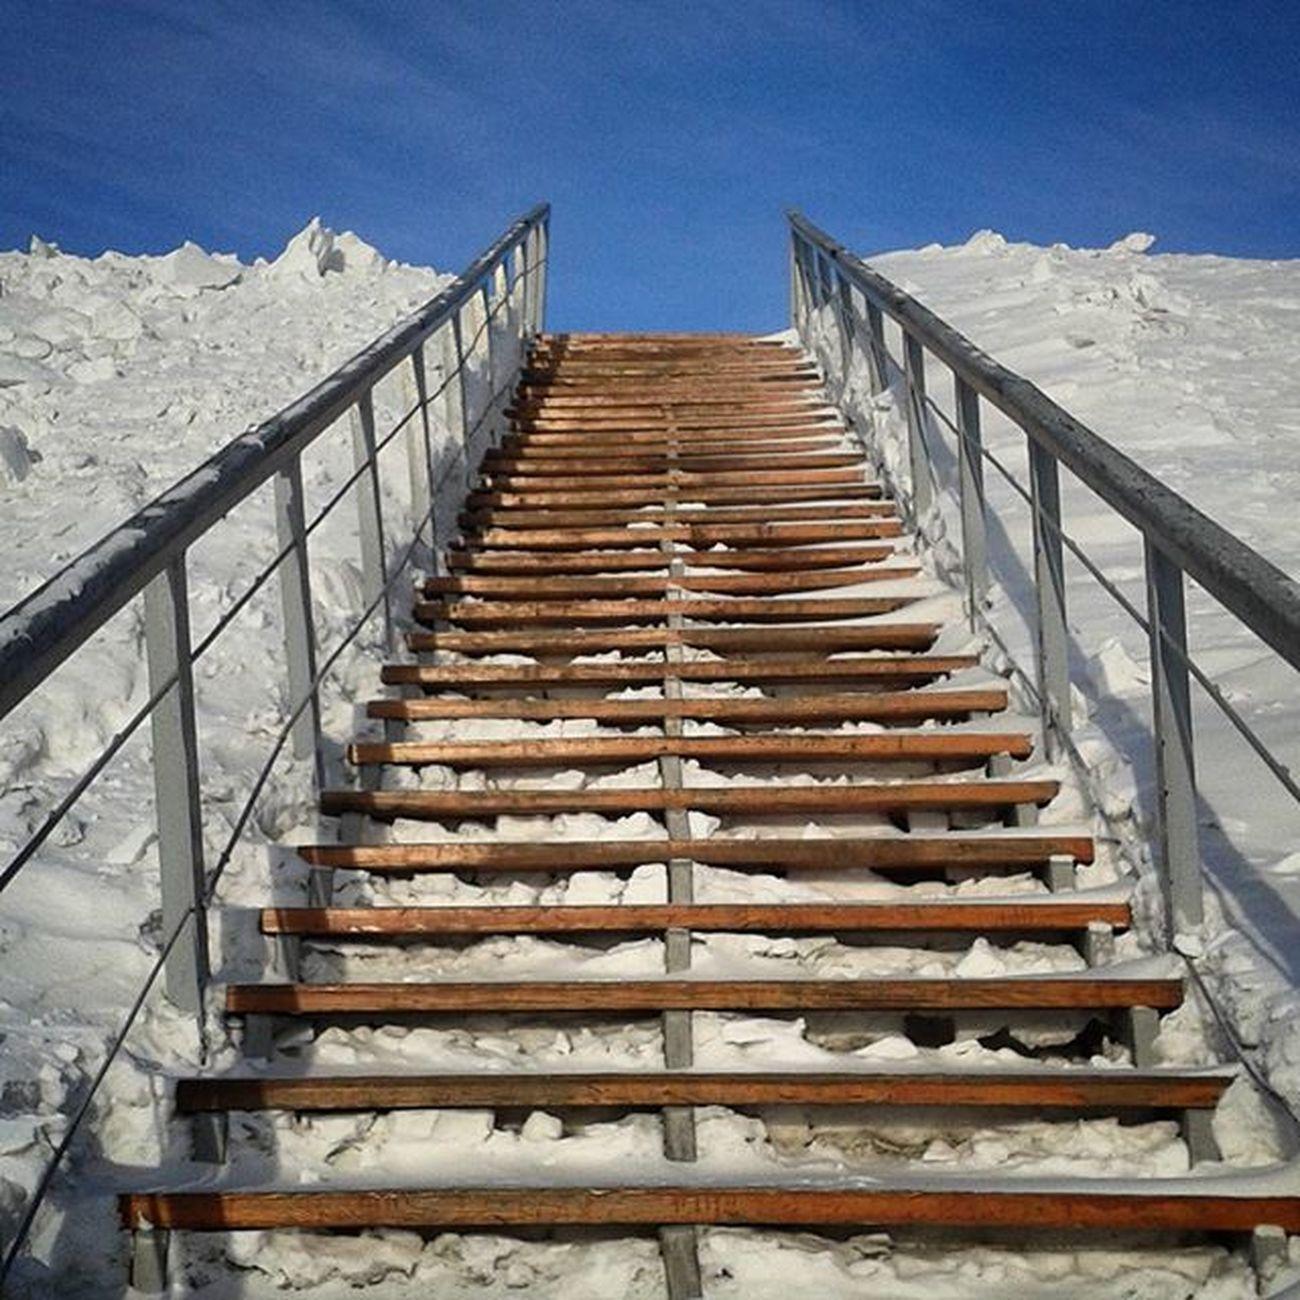 зима омск сибирь снег январь лестница сугроб Stair through the Drifts Snow Winter Omsk Siberia January